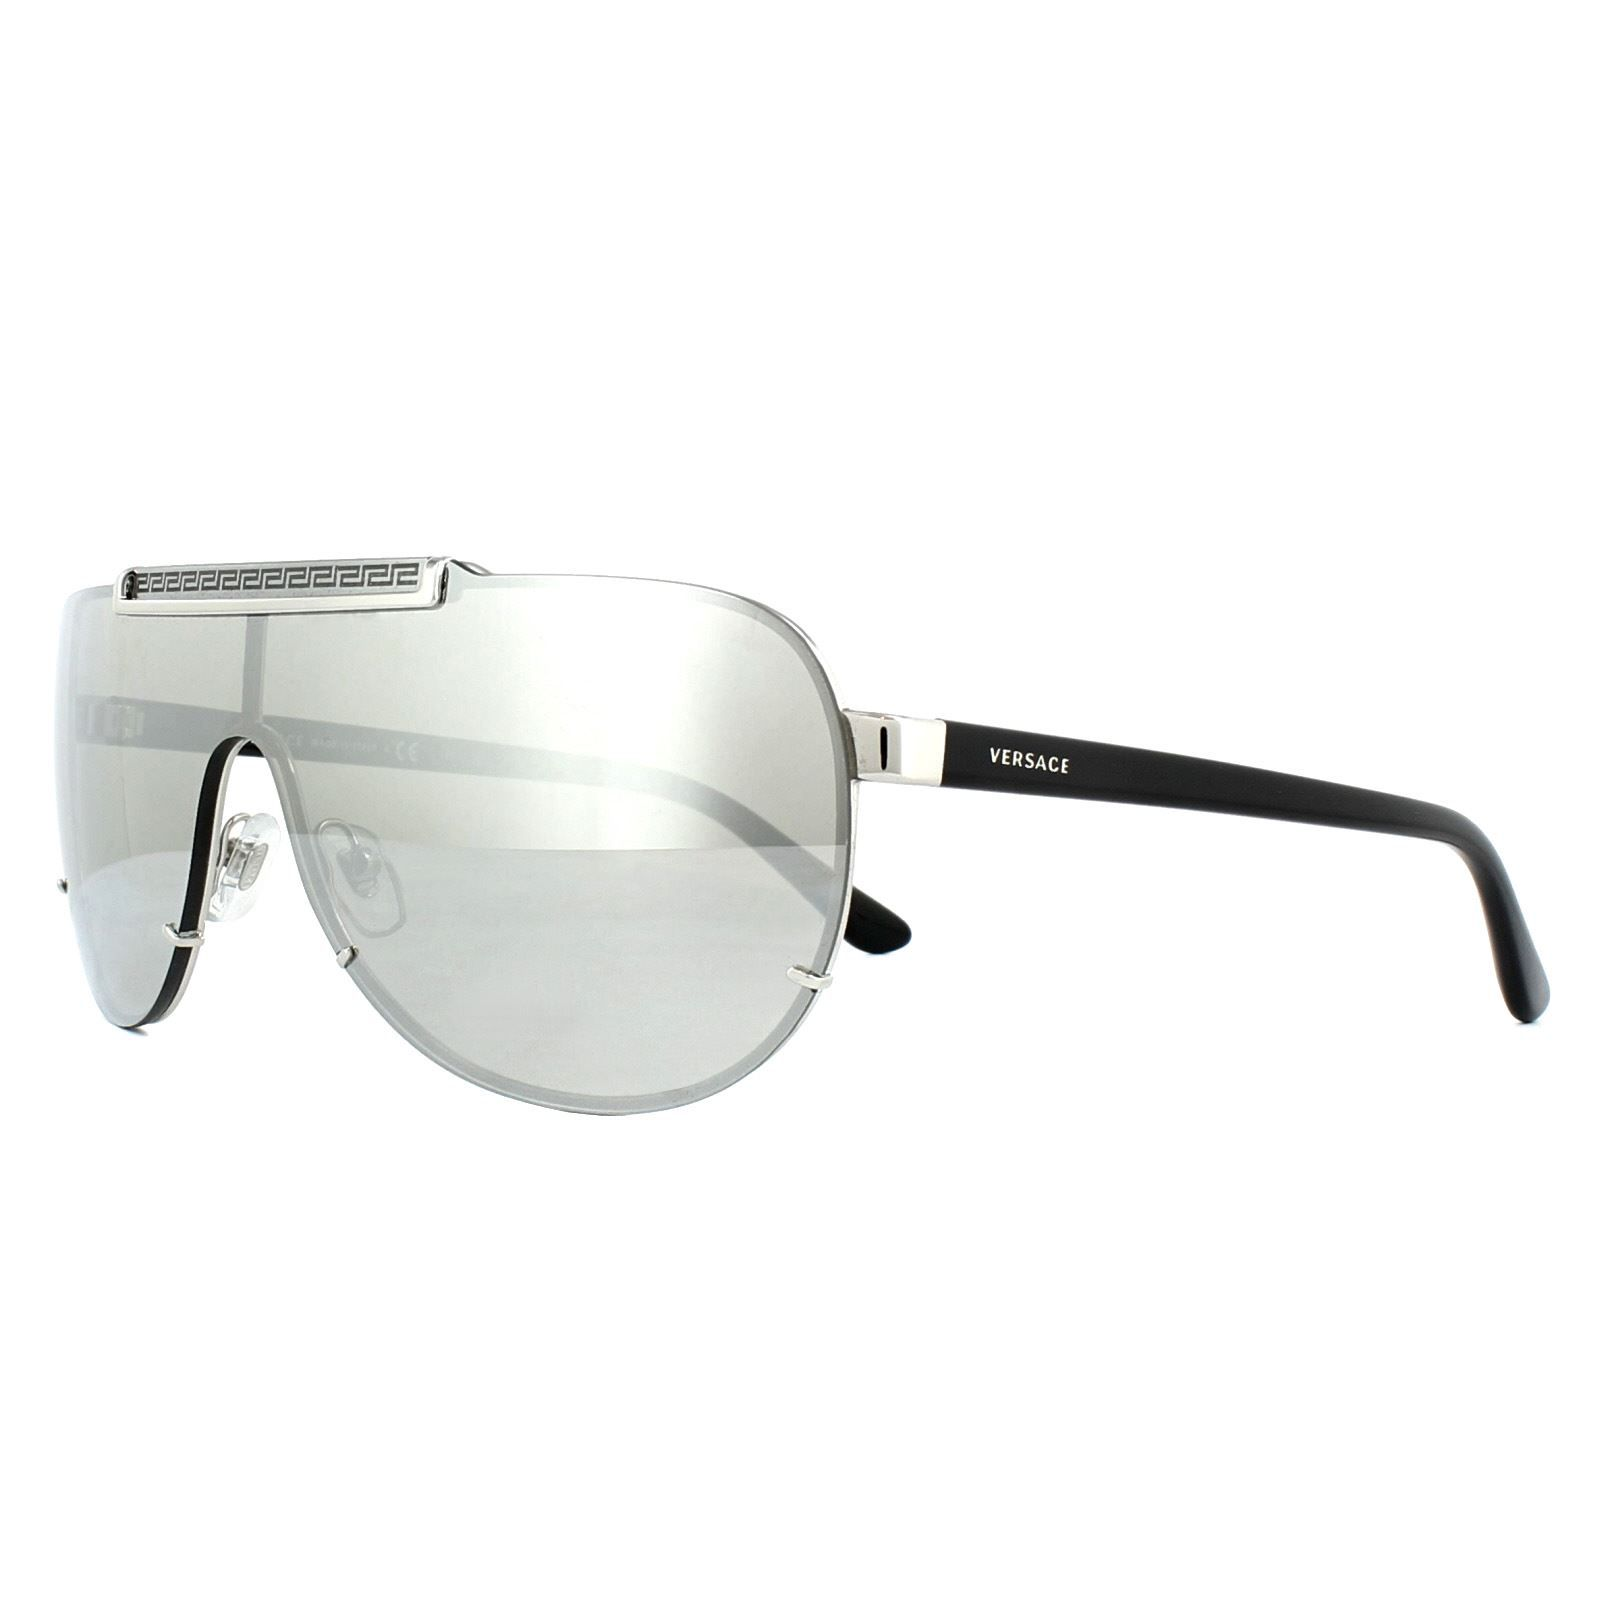 Versace Sunglasses VE2140 10006G Silver Light Grey Silver Mirror